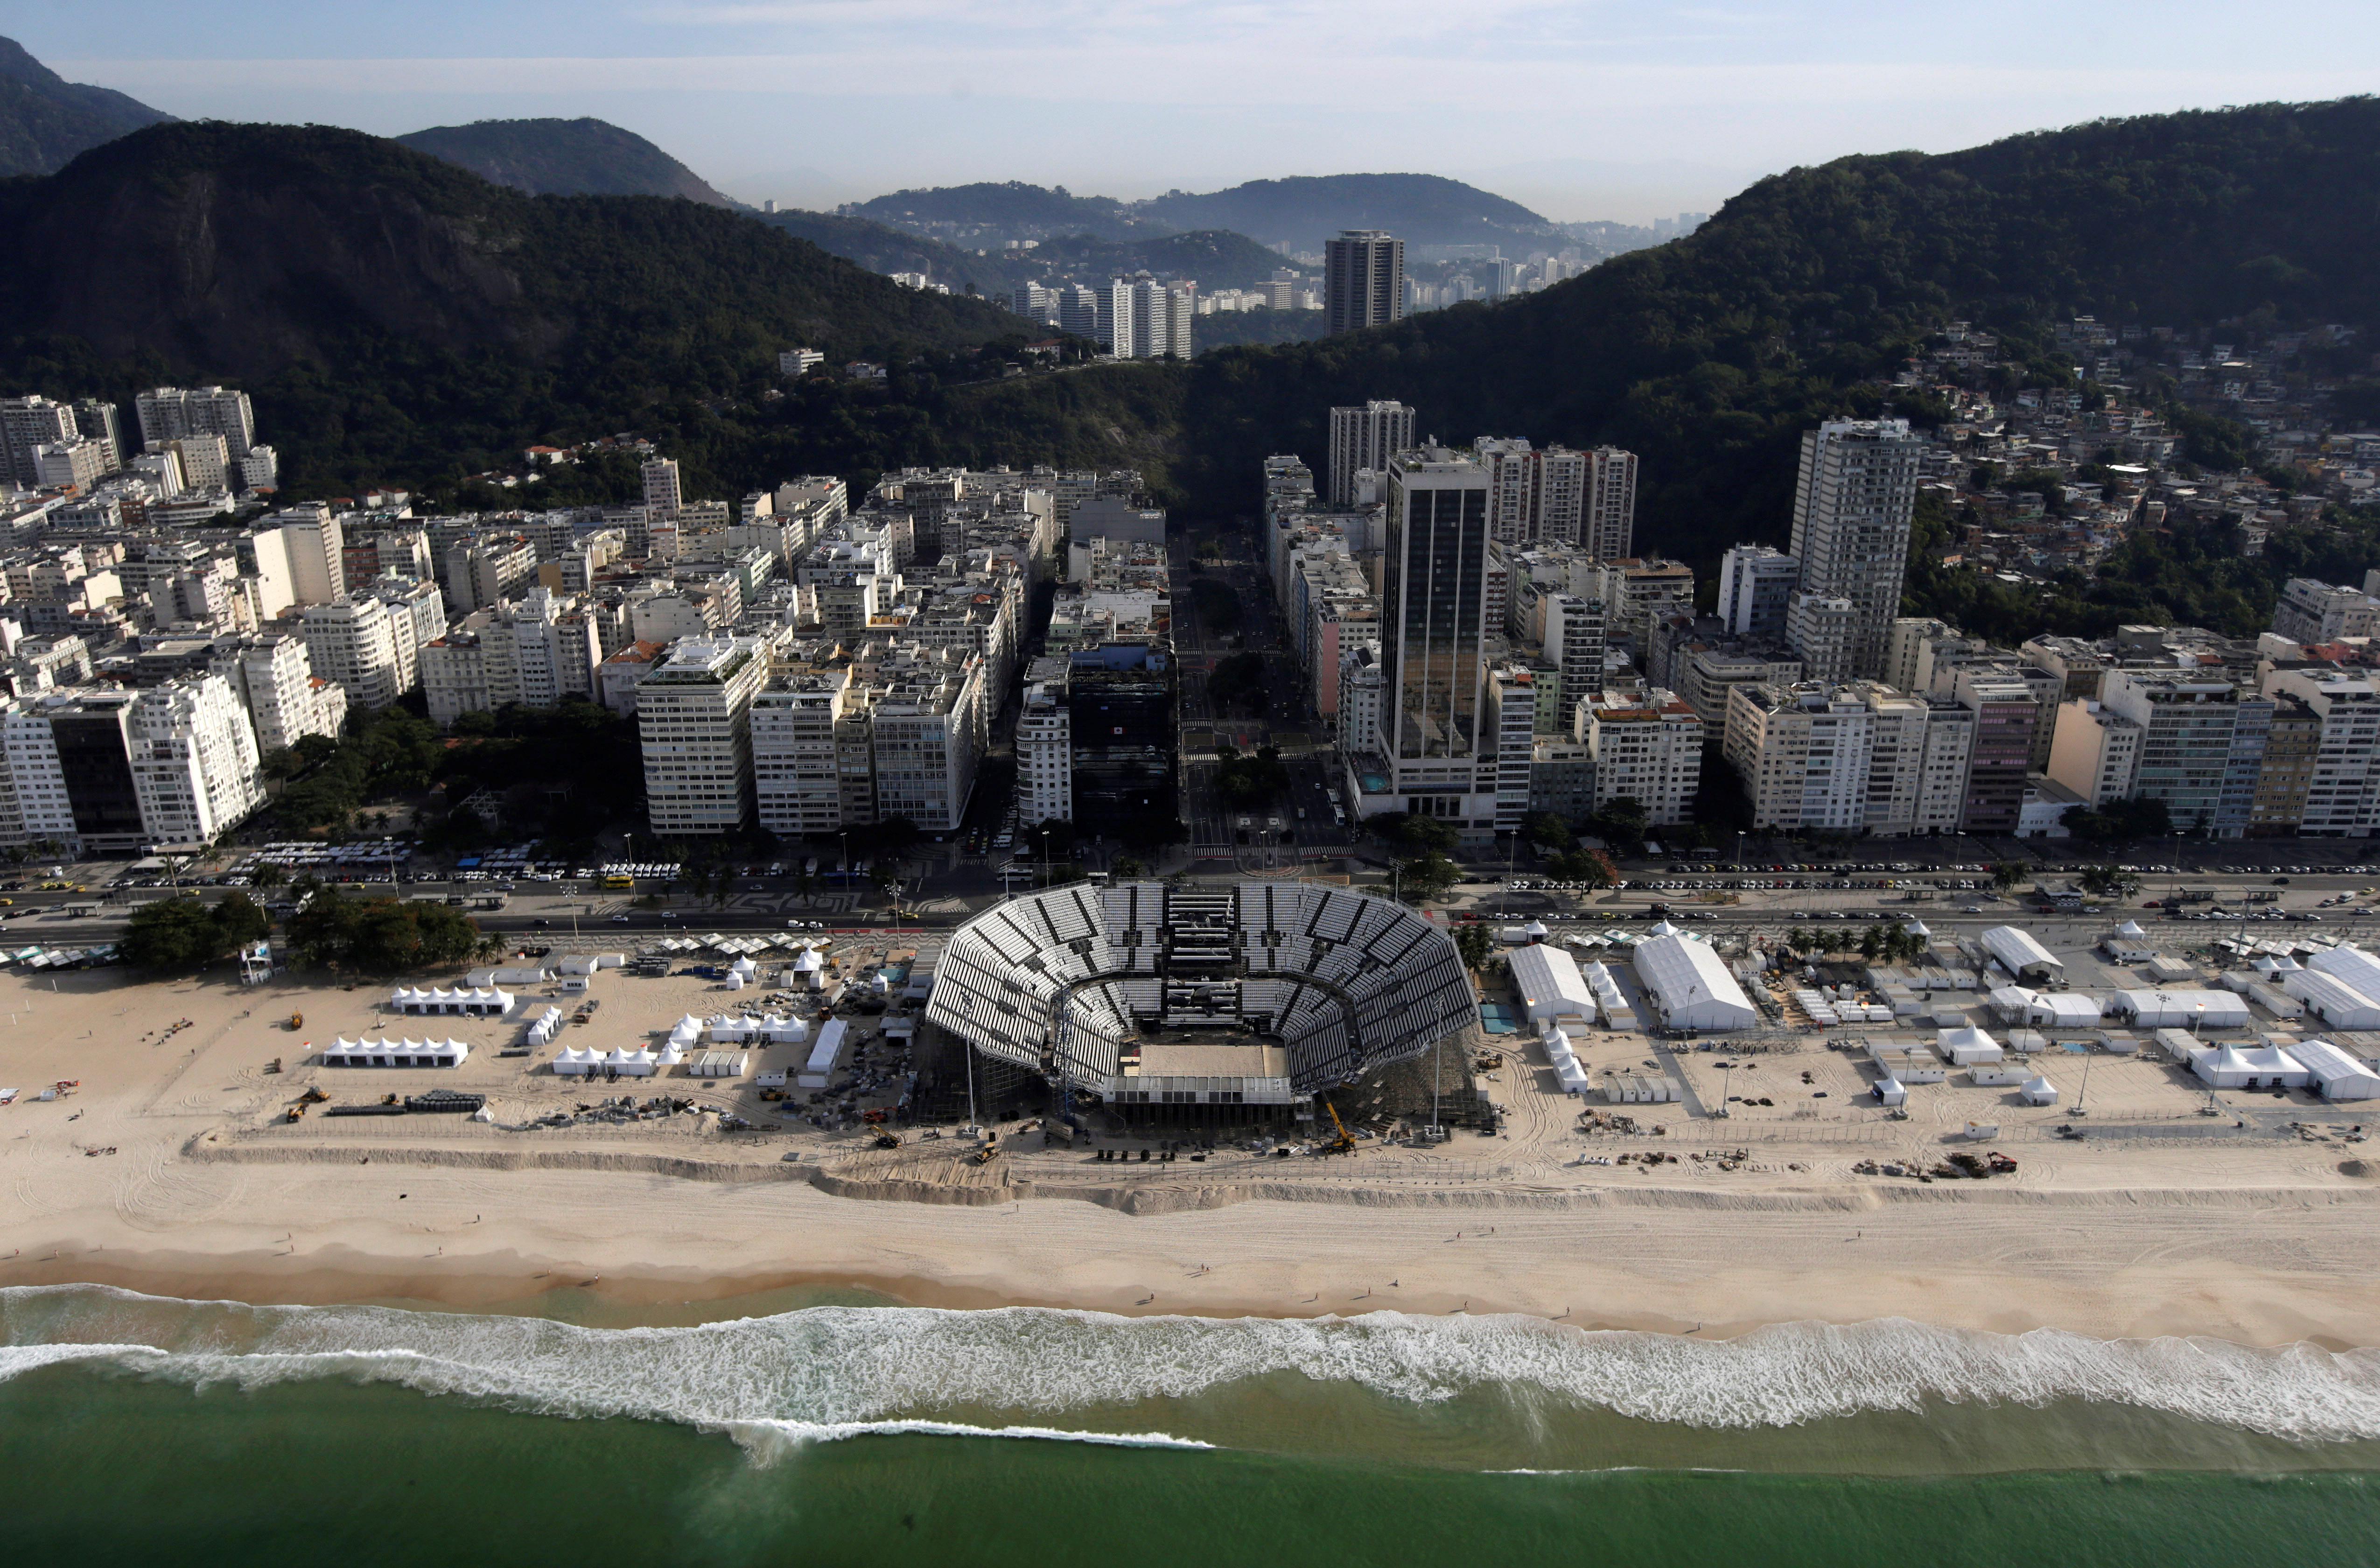 An aerial view of the 2016 Rio Olympics beach volleyball venue on Copacabana beach in Rio de Janeiro